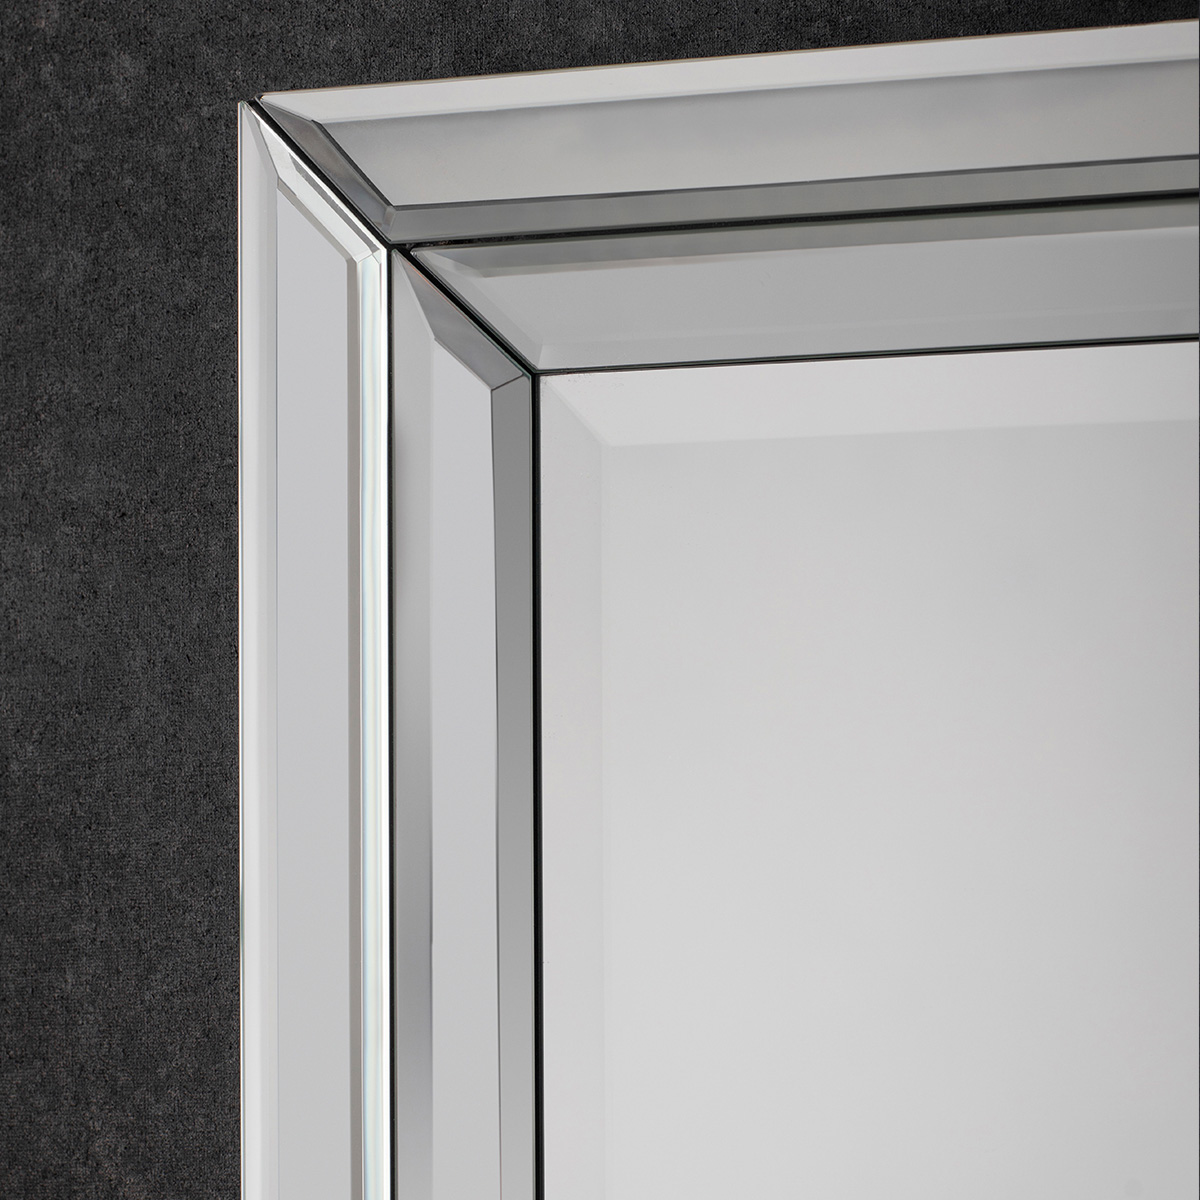 Eva wall mirror at FADS.co.uk